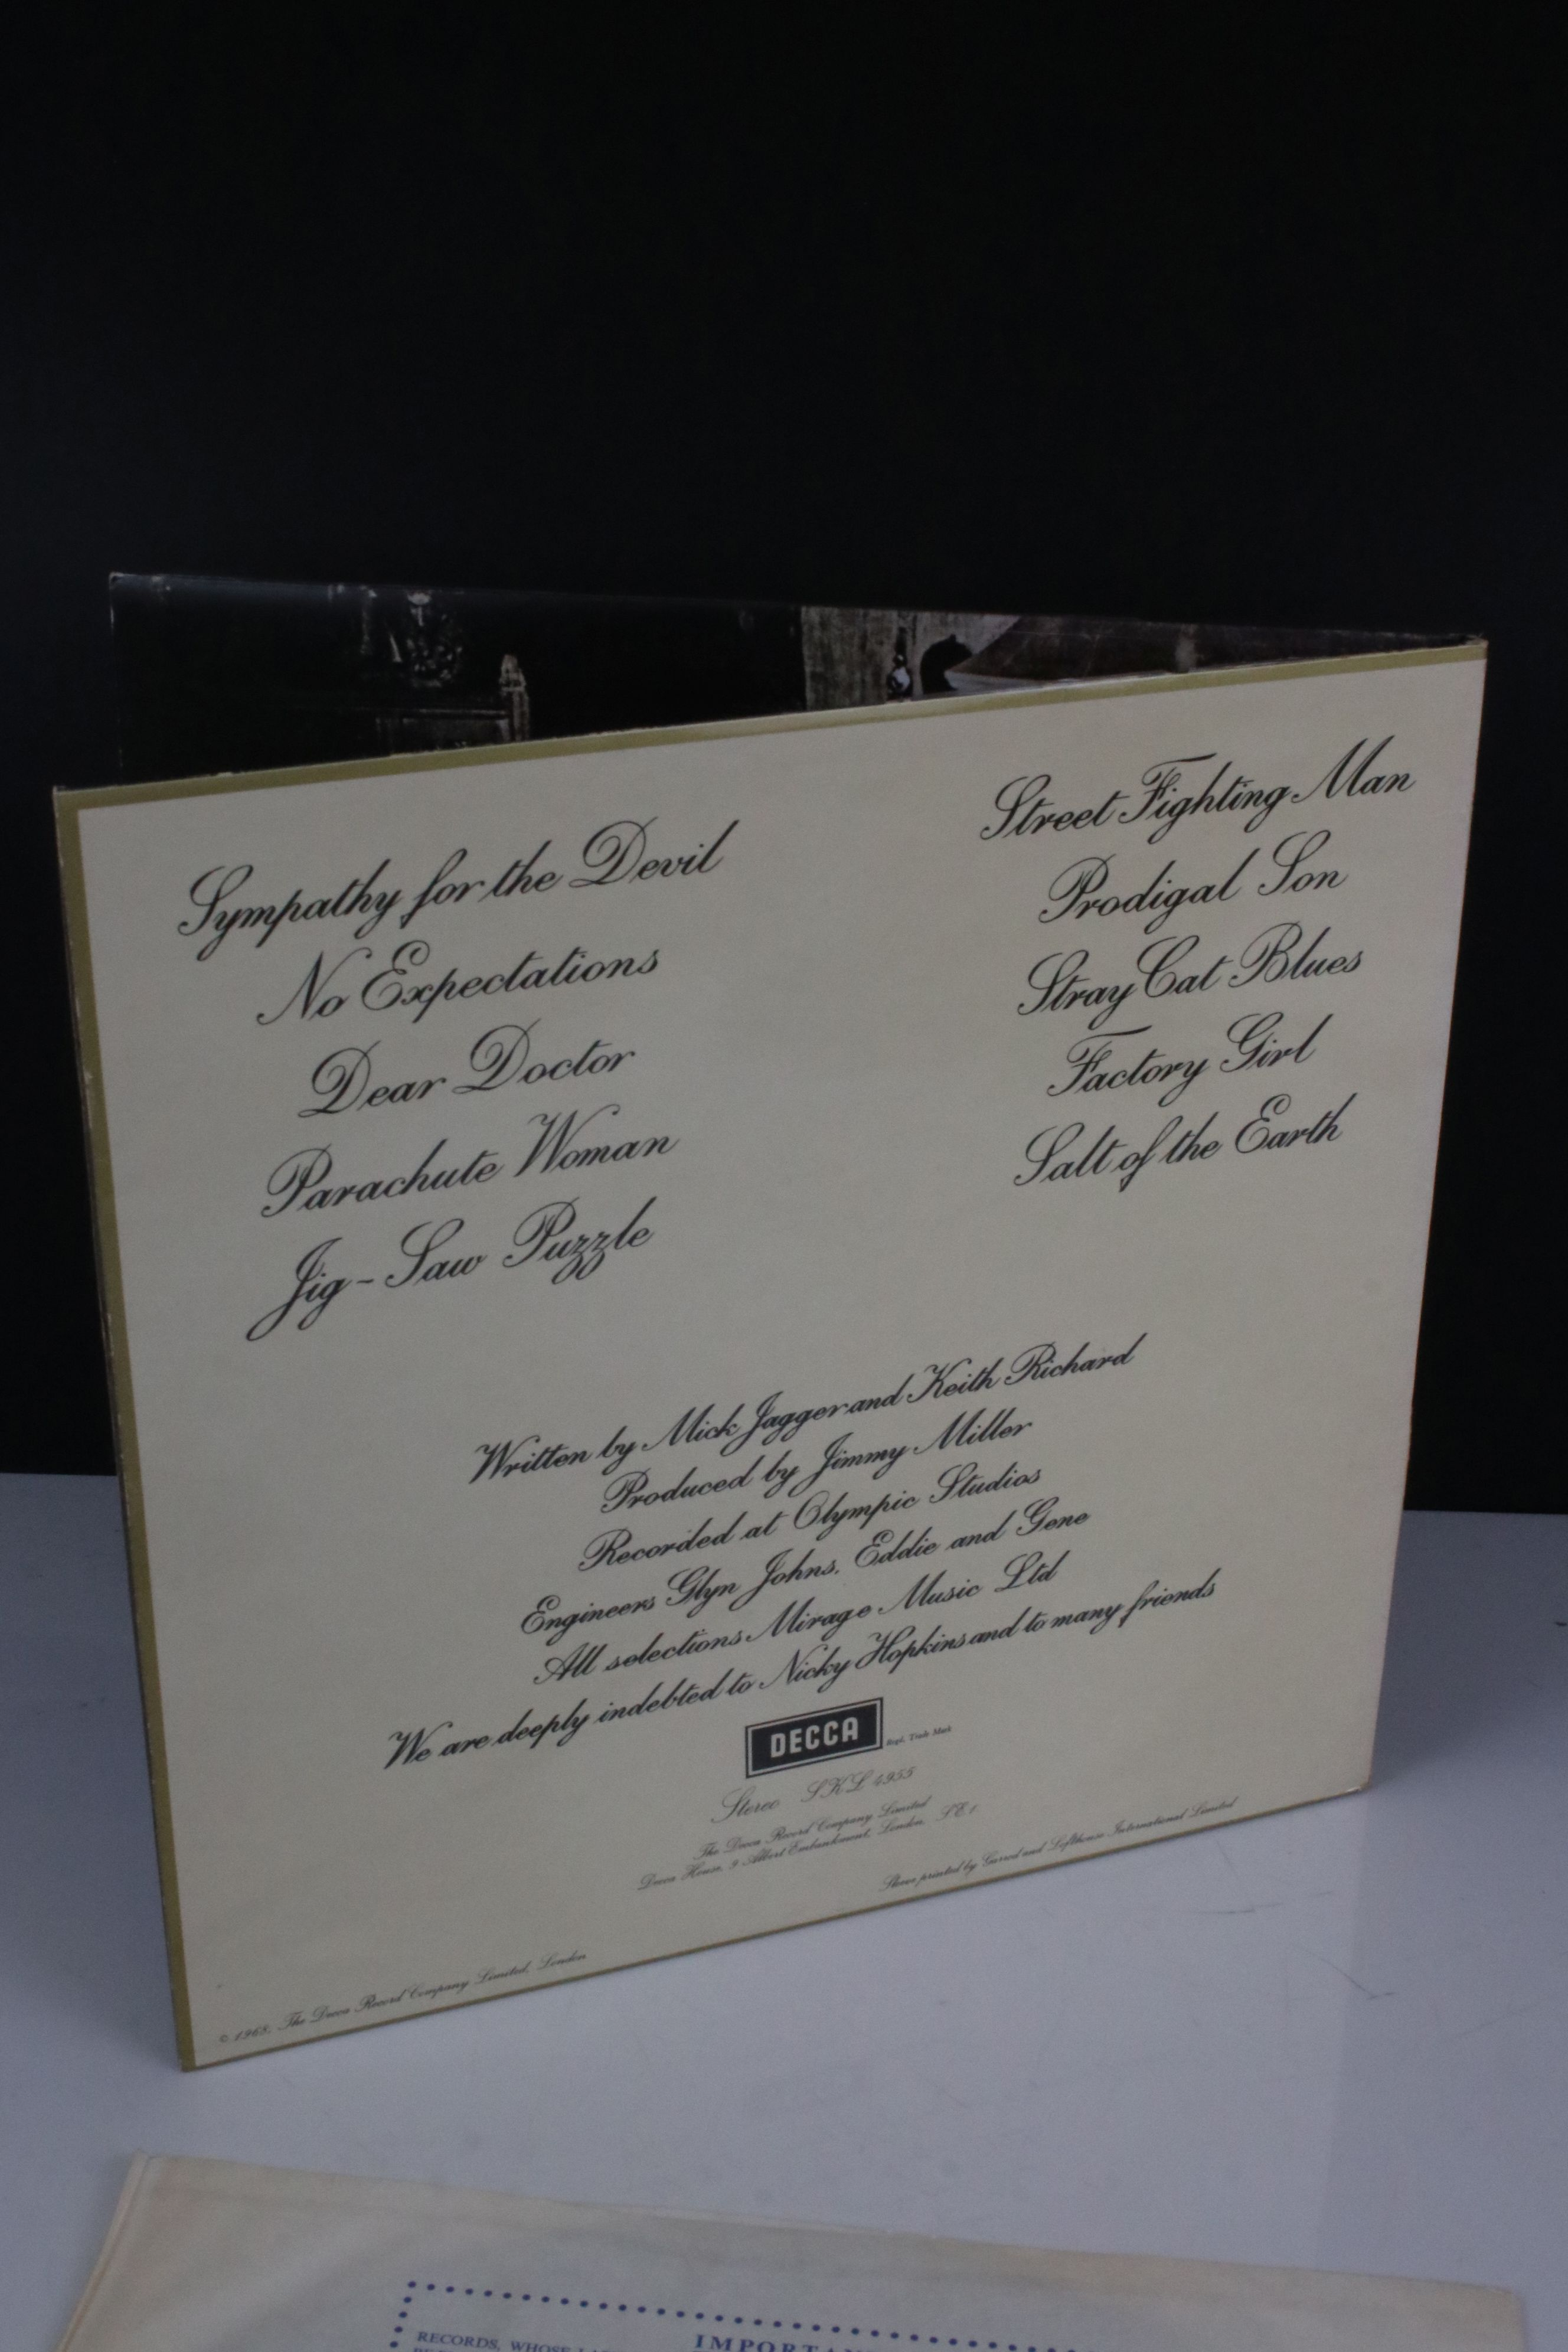 Vinyl - The Rolling Stones Beggars Banquet (SKL 4955) blue Decca label, Mirage Music, titles - Image 6 of 6